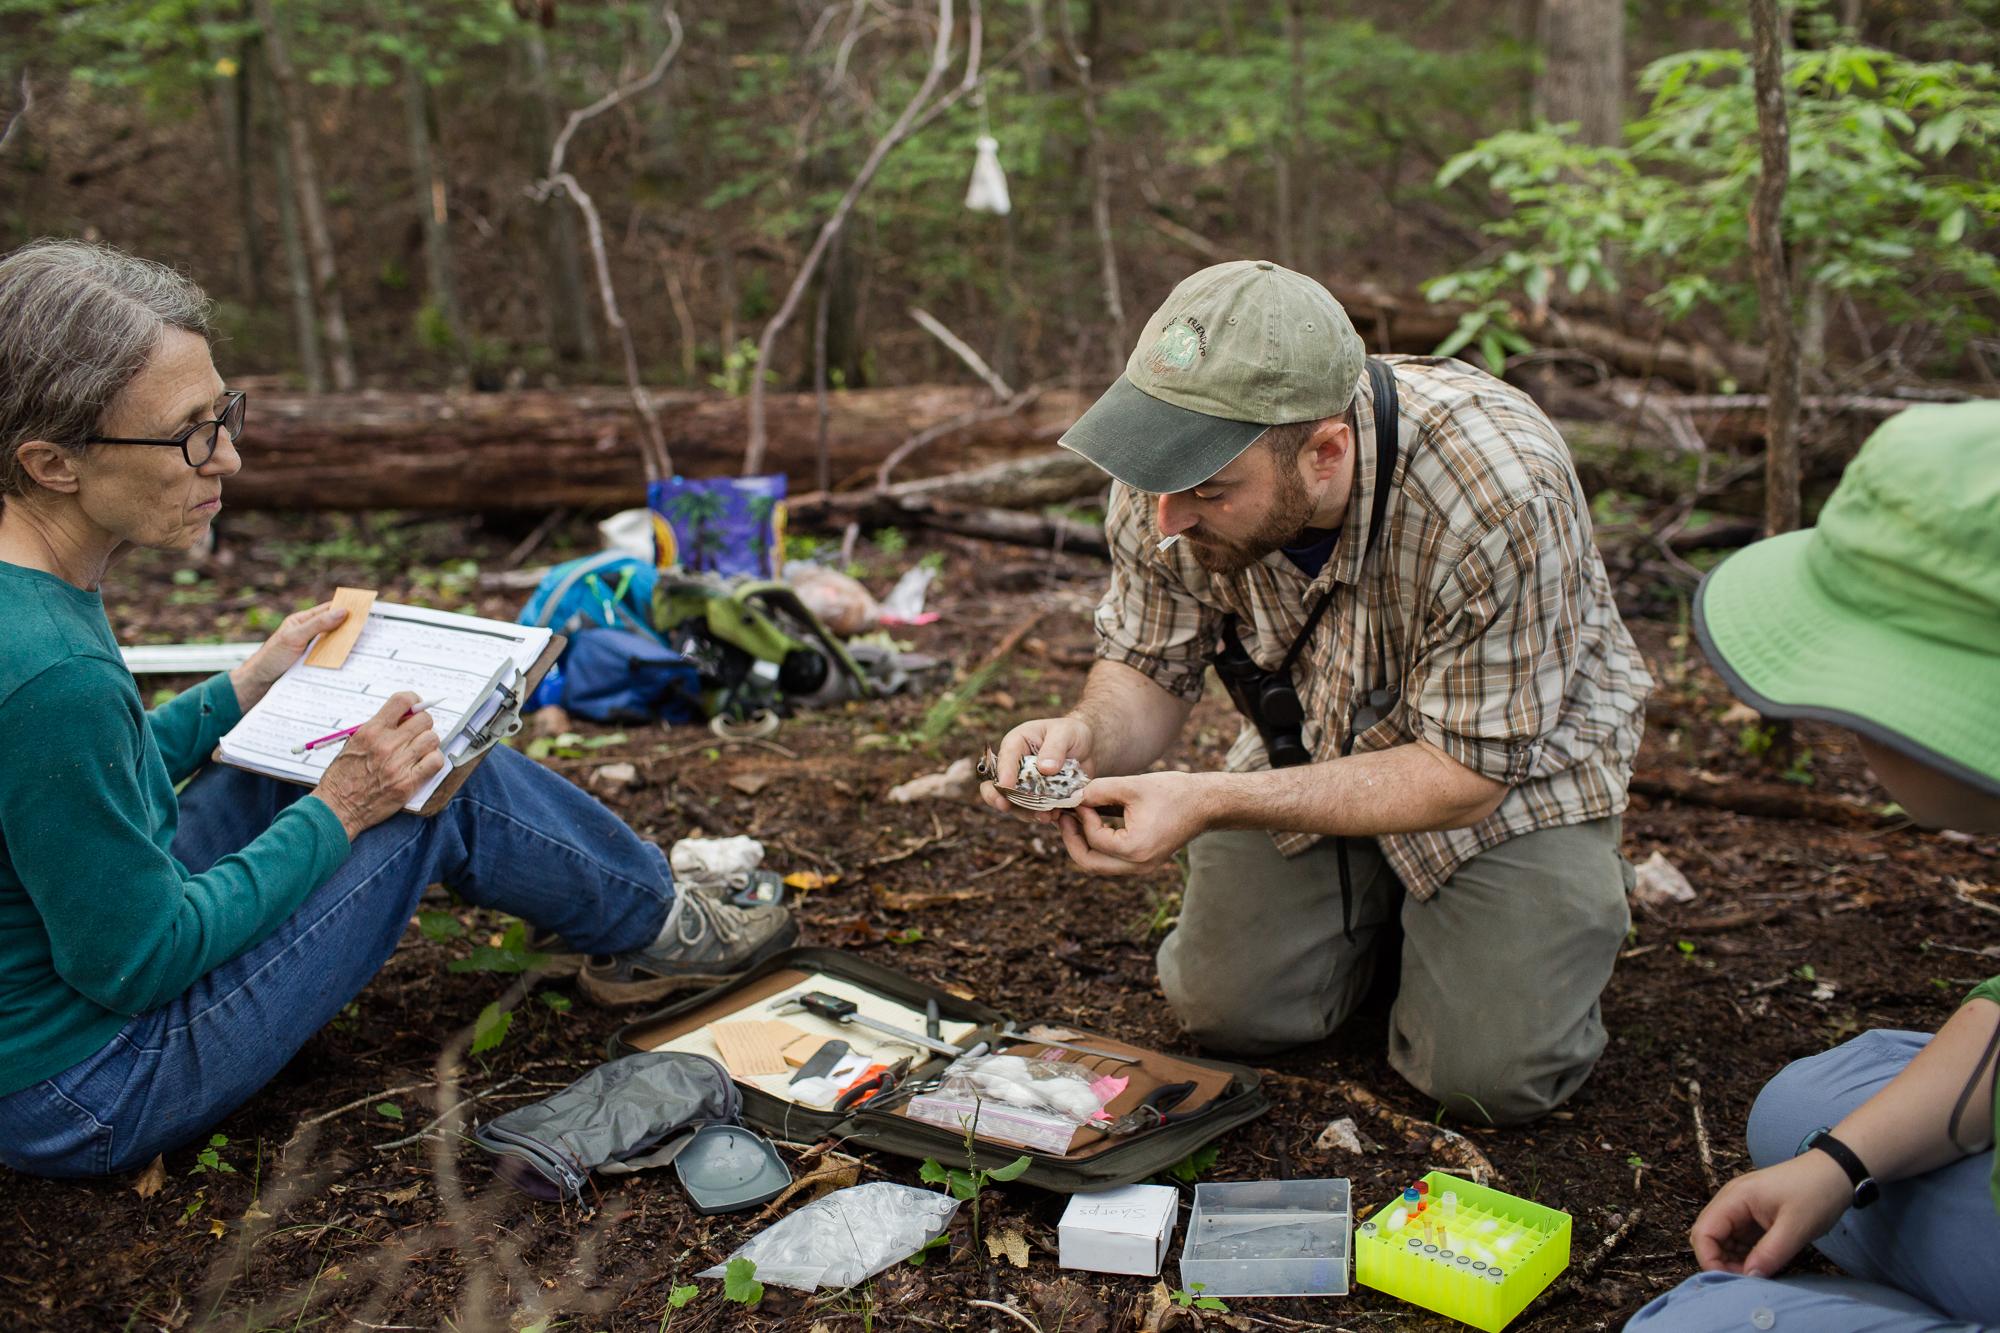 Scientists Tag a Wood Thrush in North Carolina